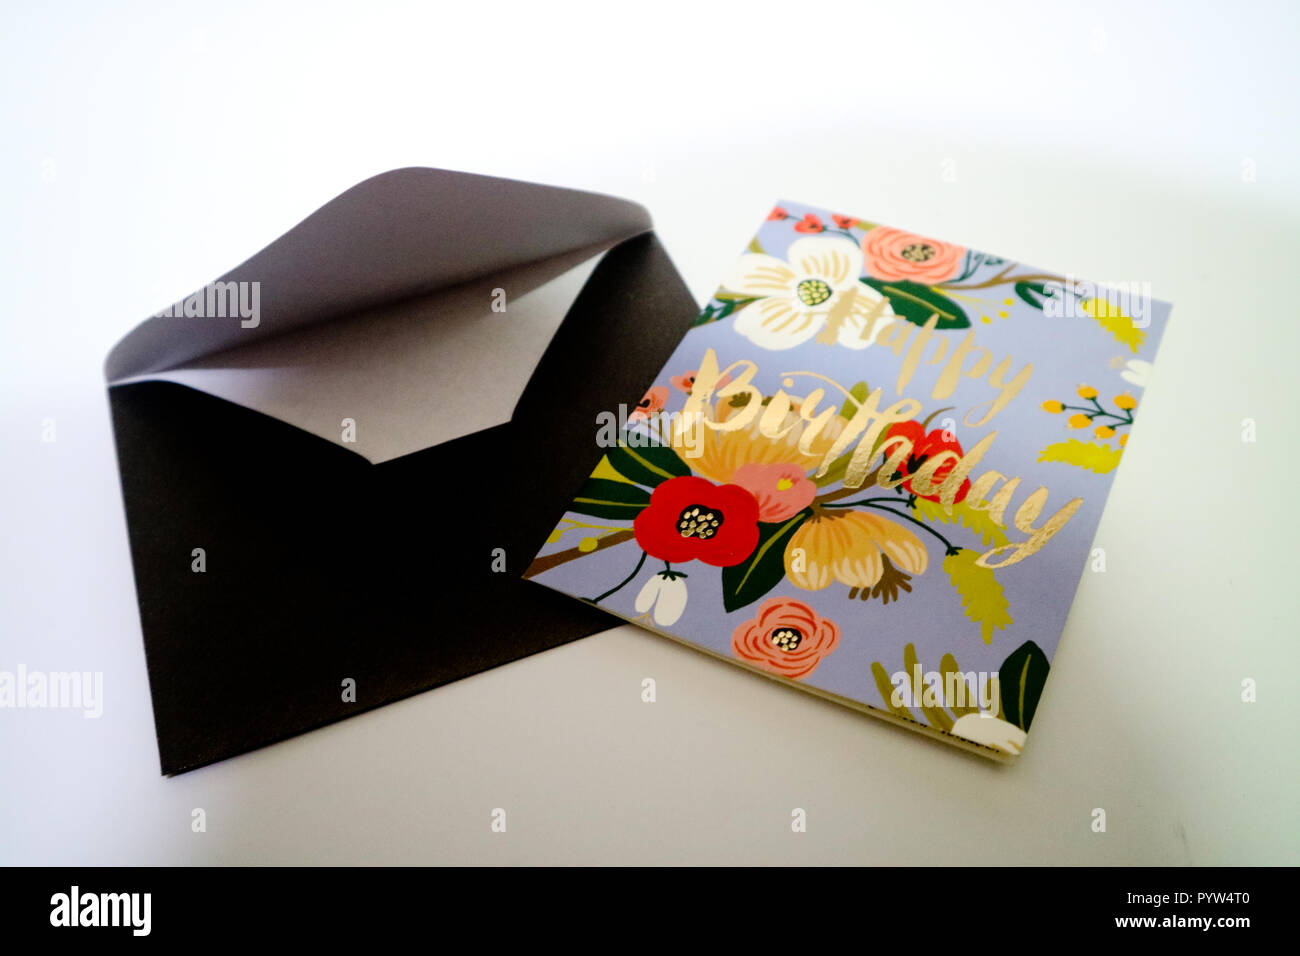 birthday greeting card - Stock Image